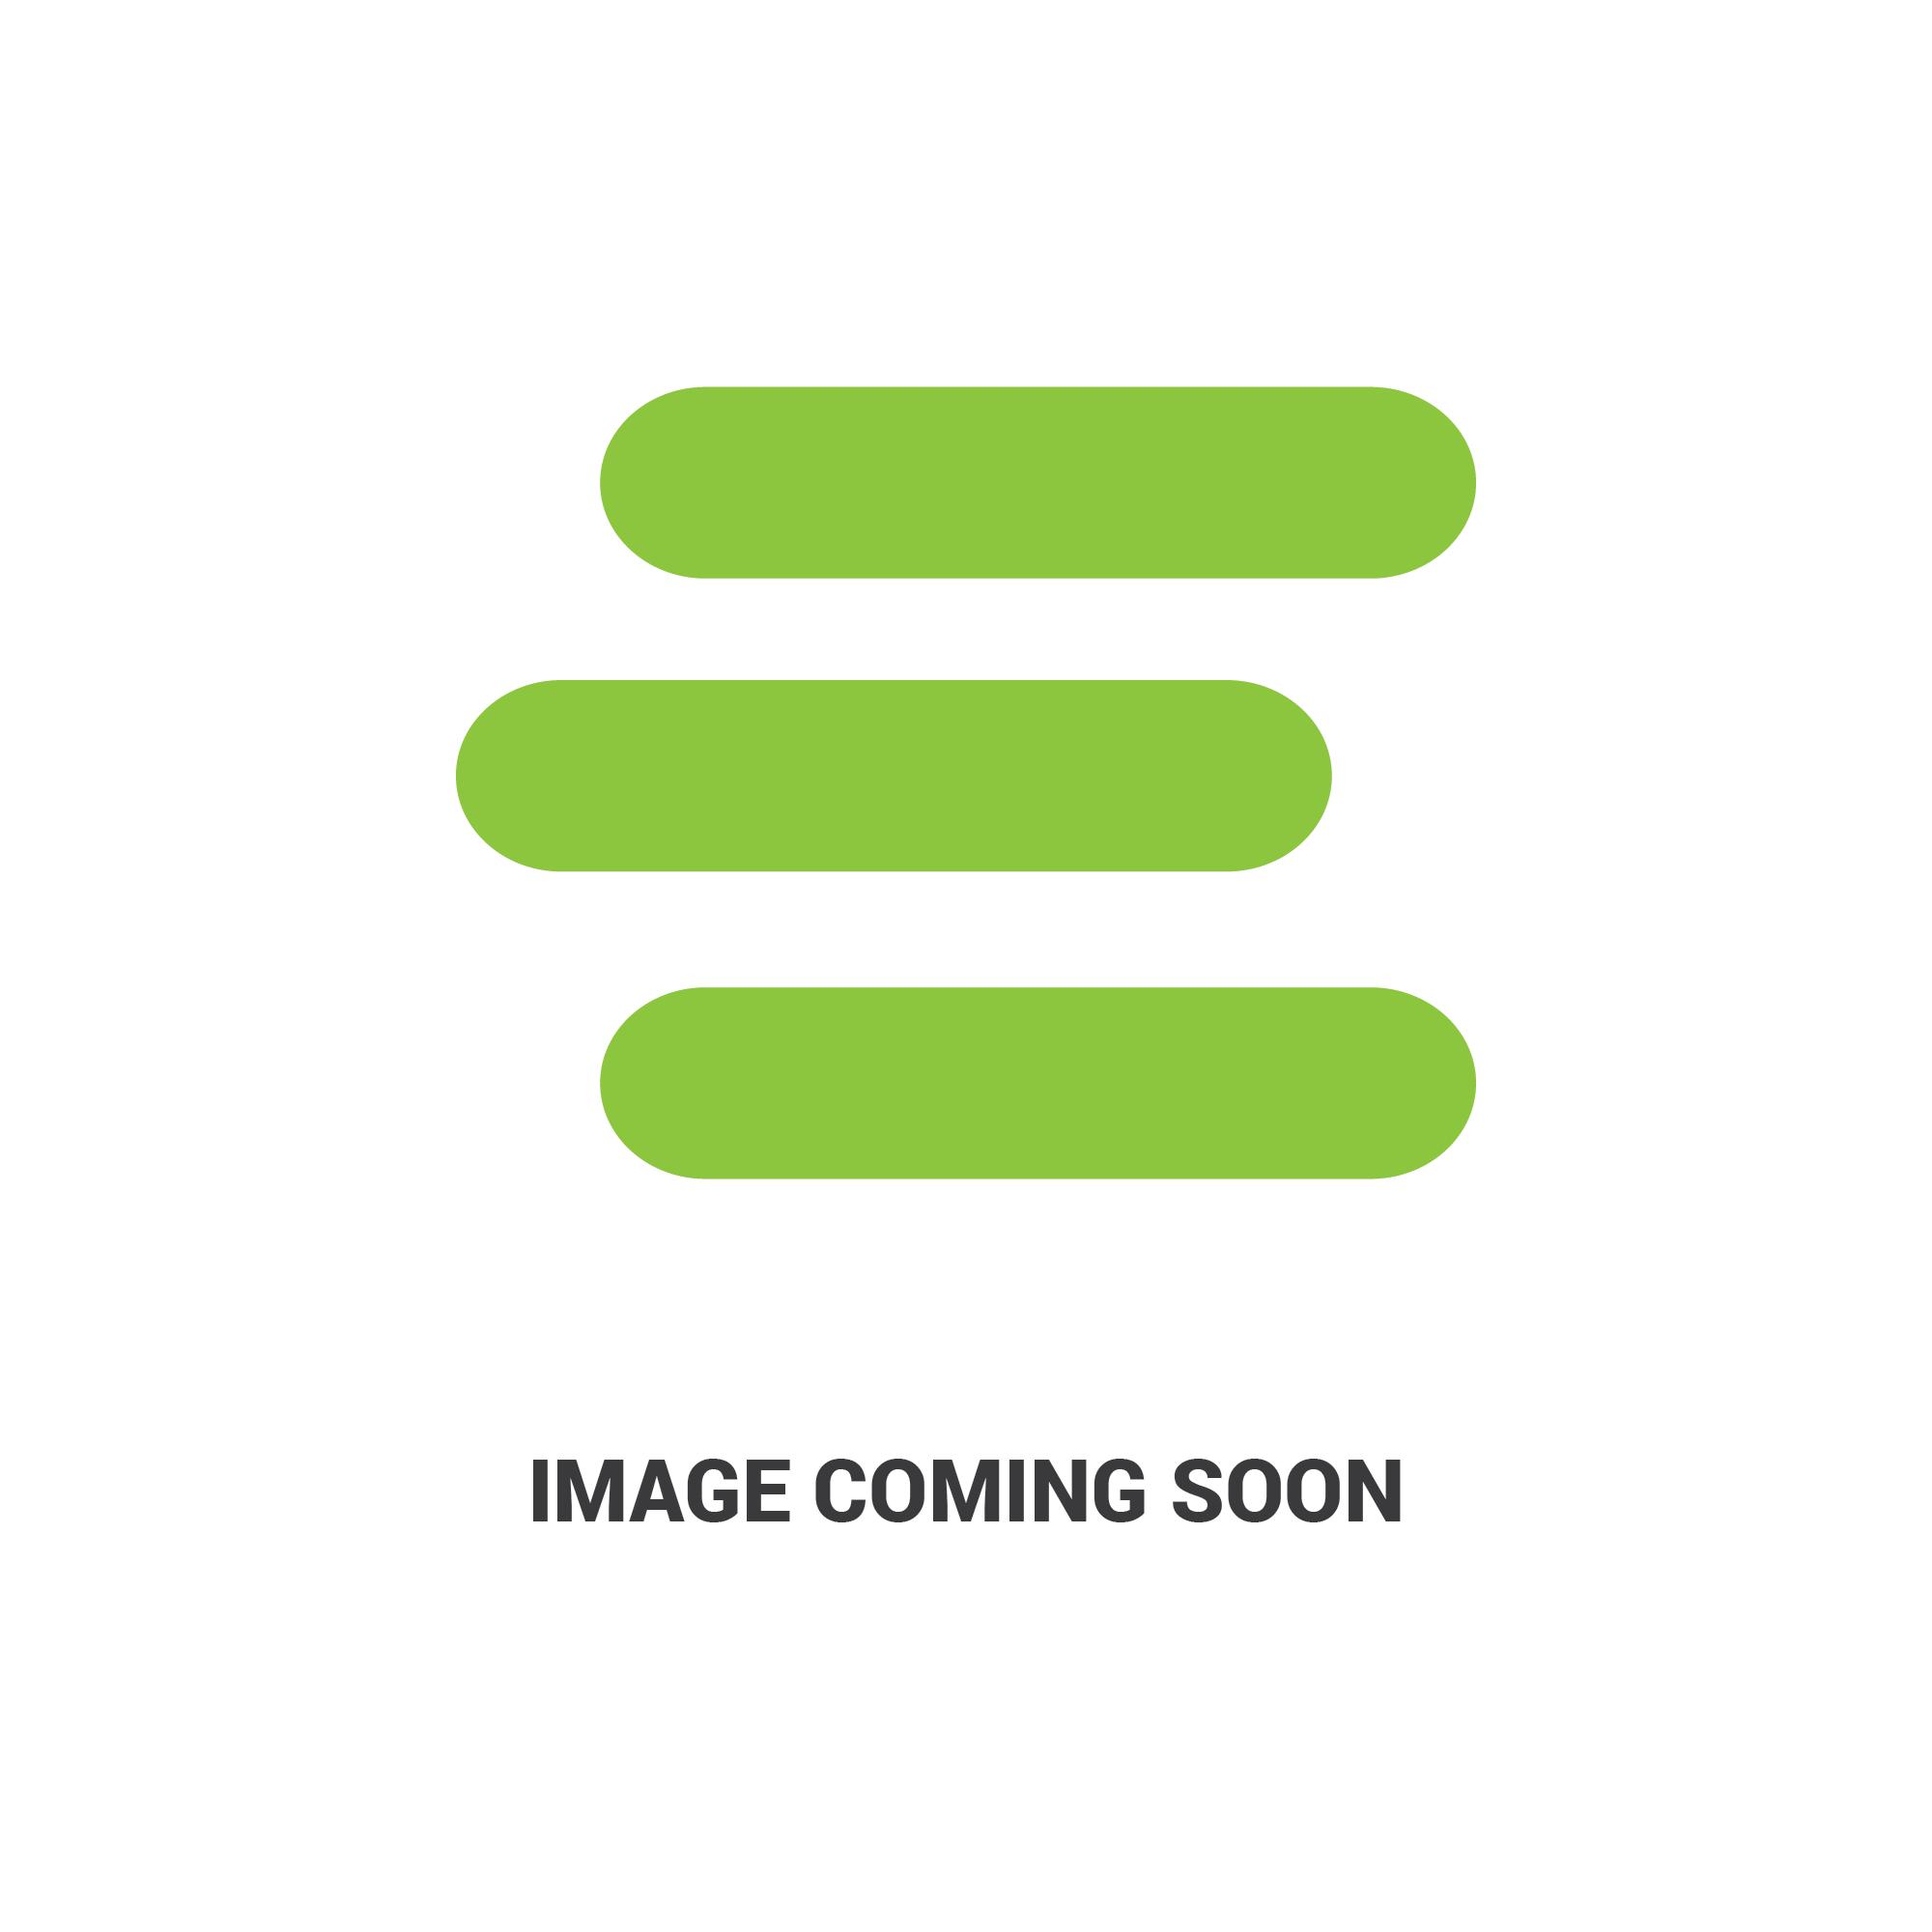 E-70152731151_1.jpg